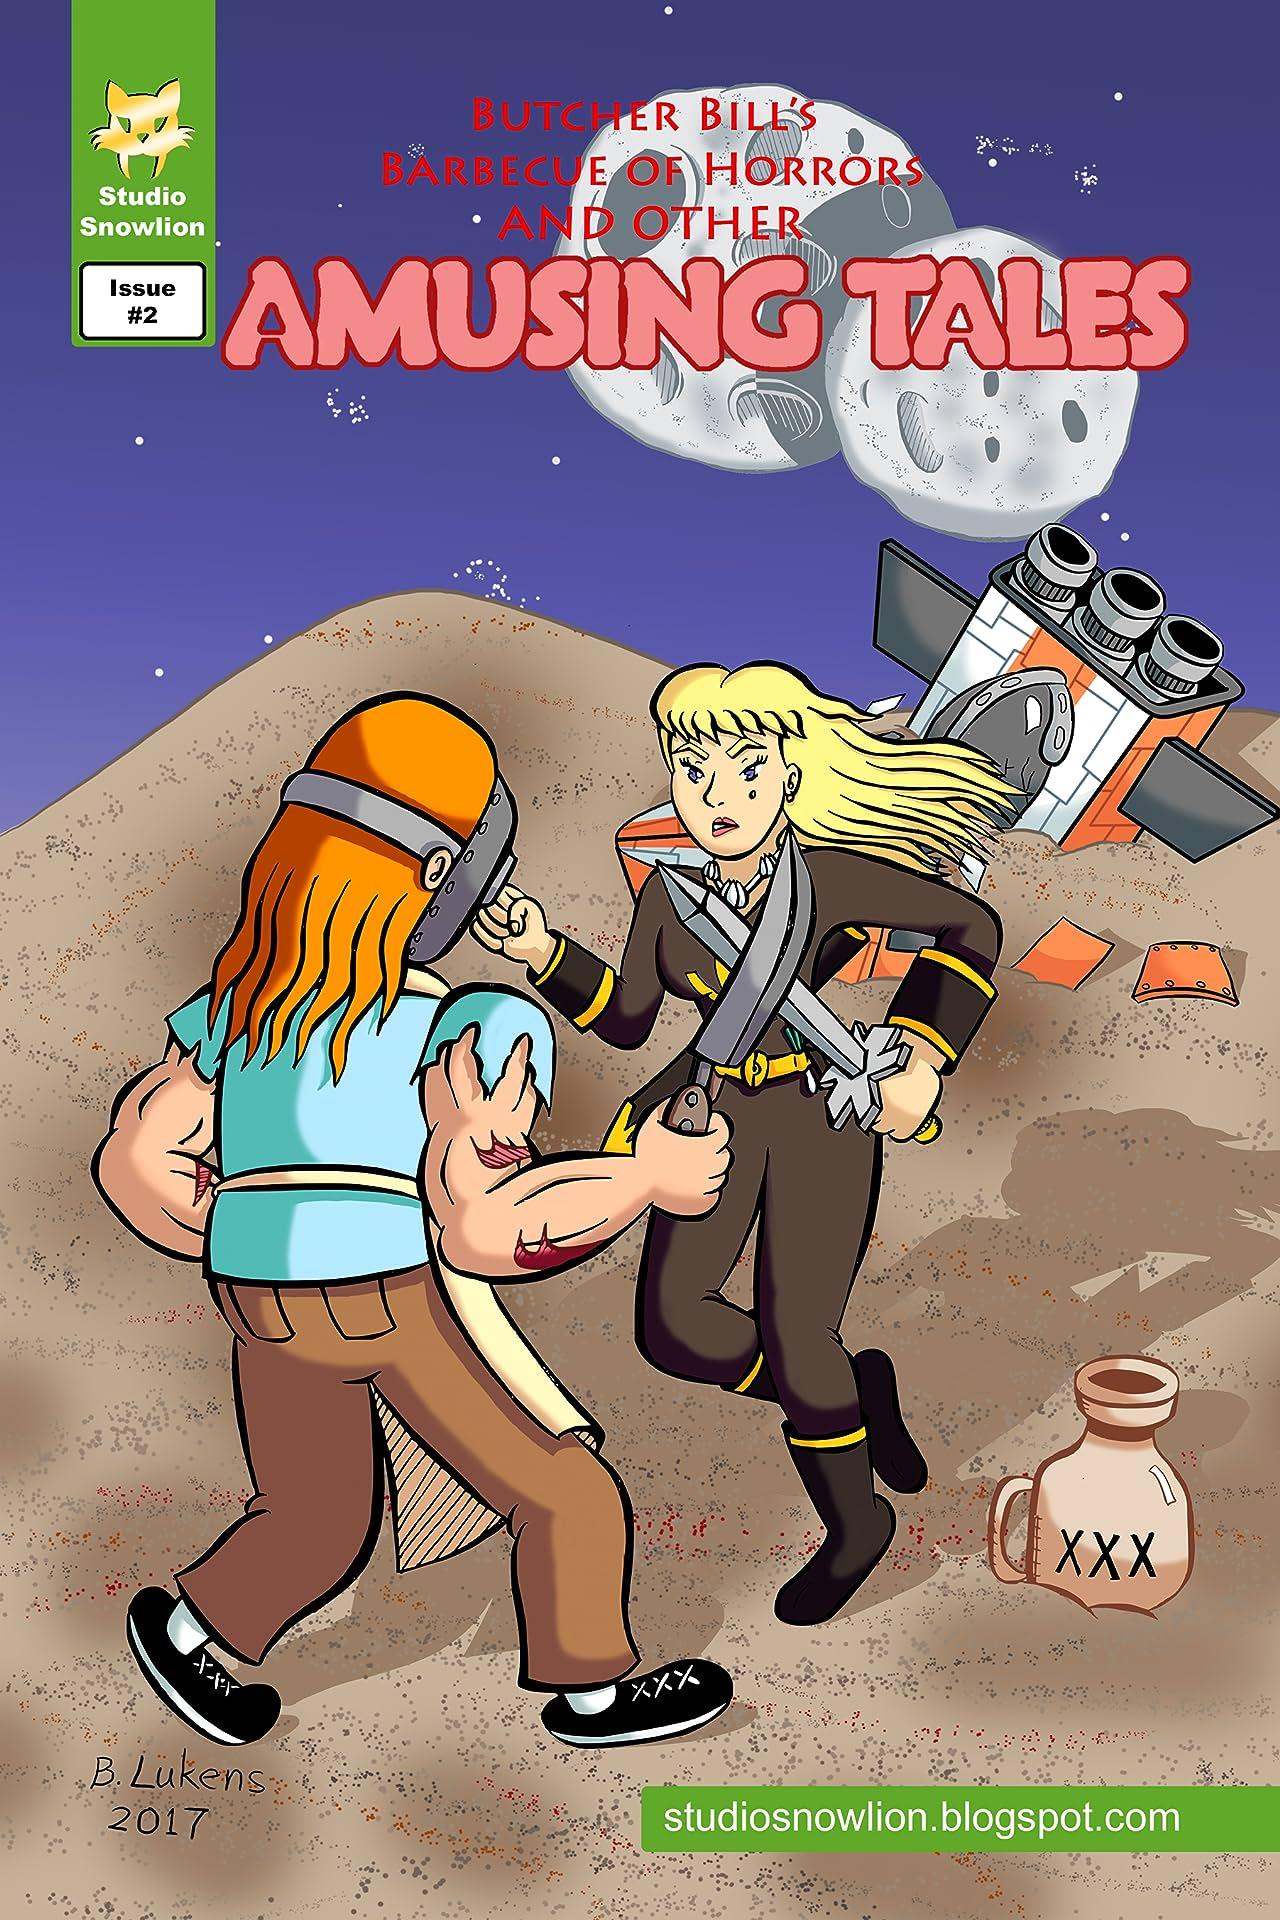 Amusing Tales #2